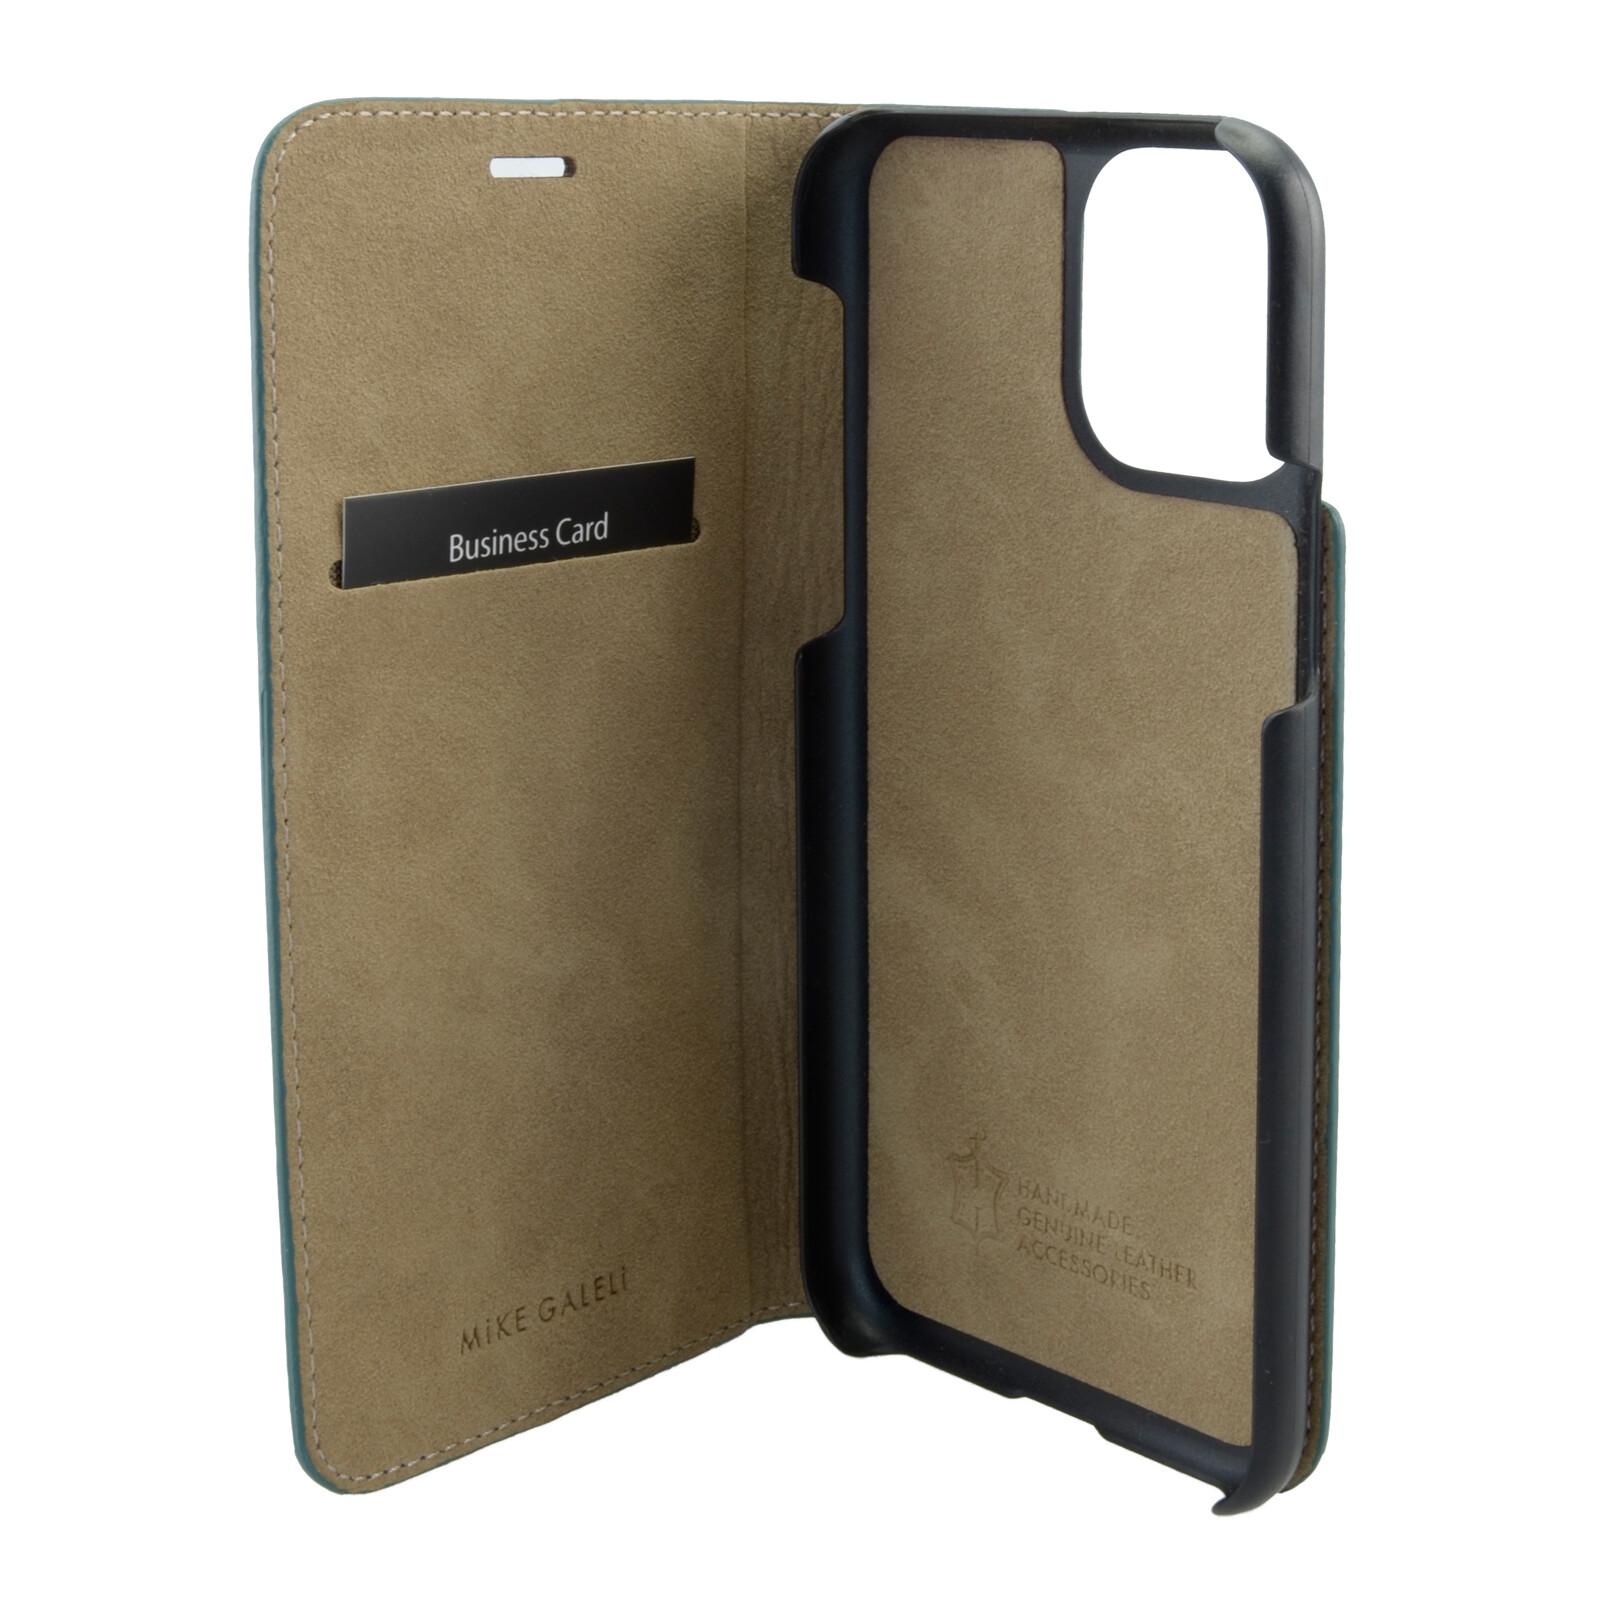 Galeli Book Case MARC Apple iPhone 11 Pro Max